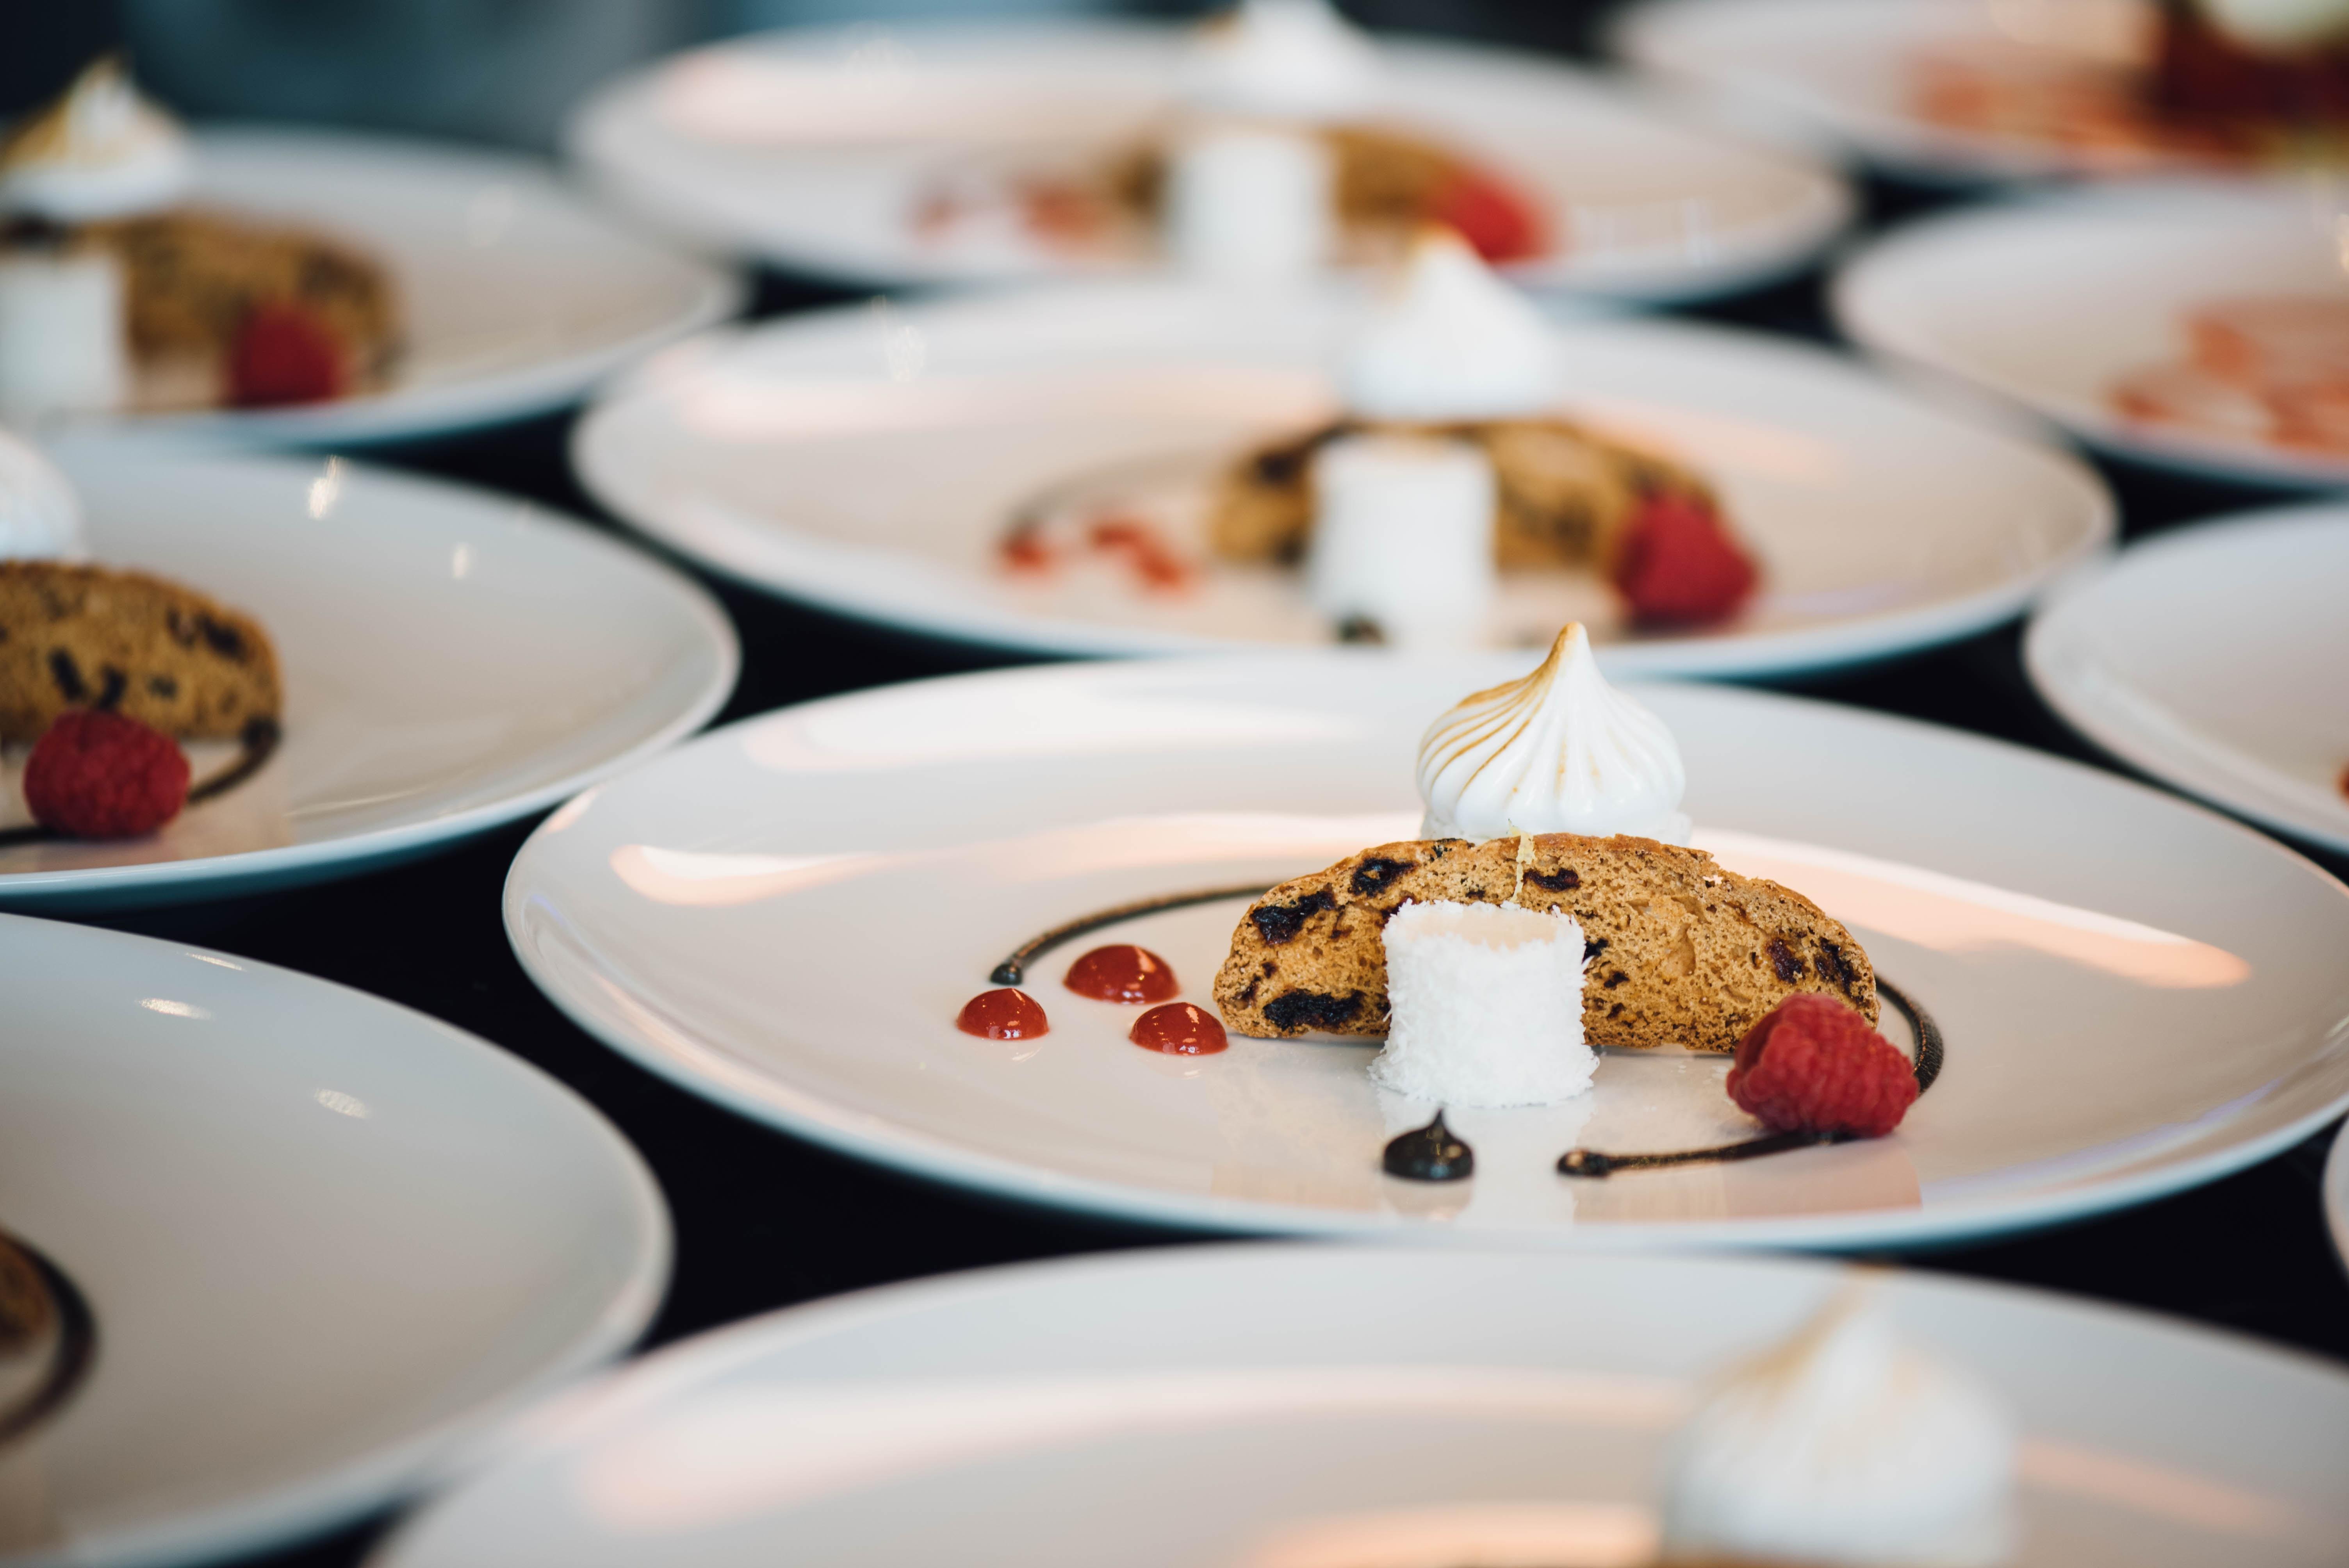 desserts served on white ceramic plates